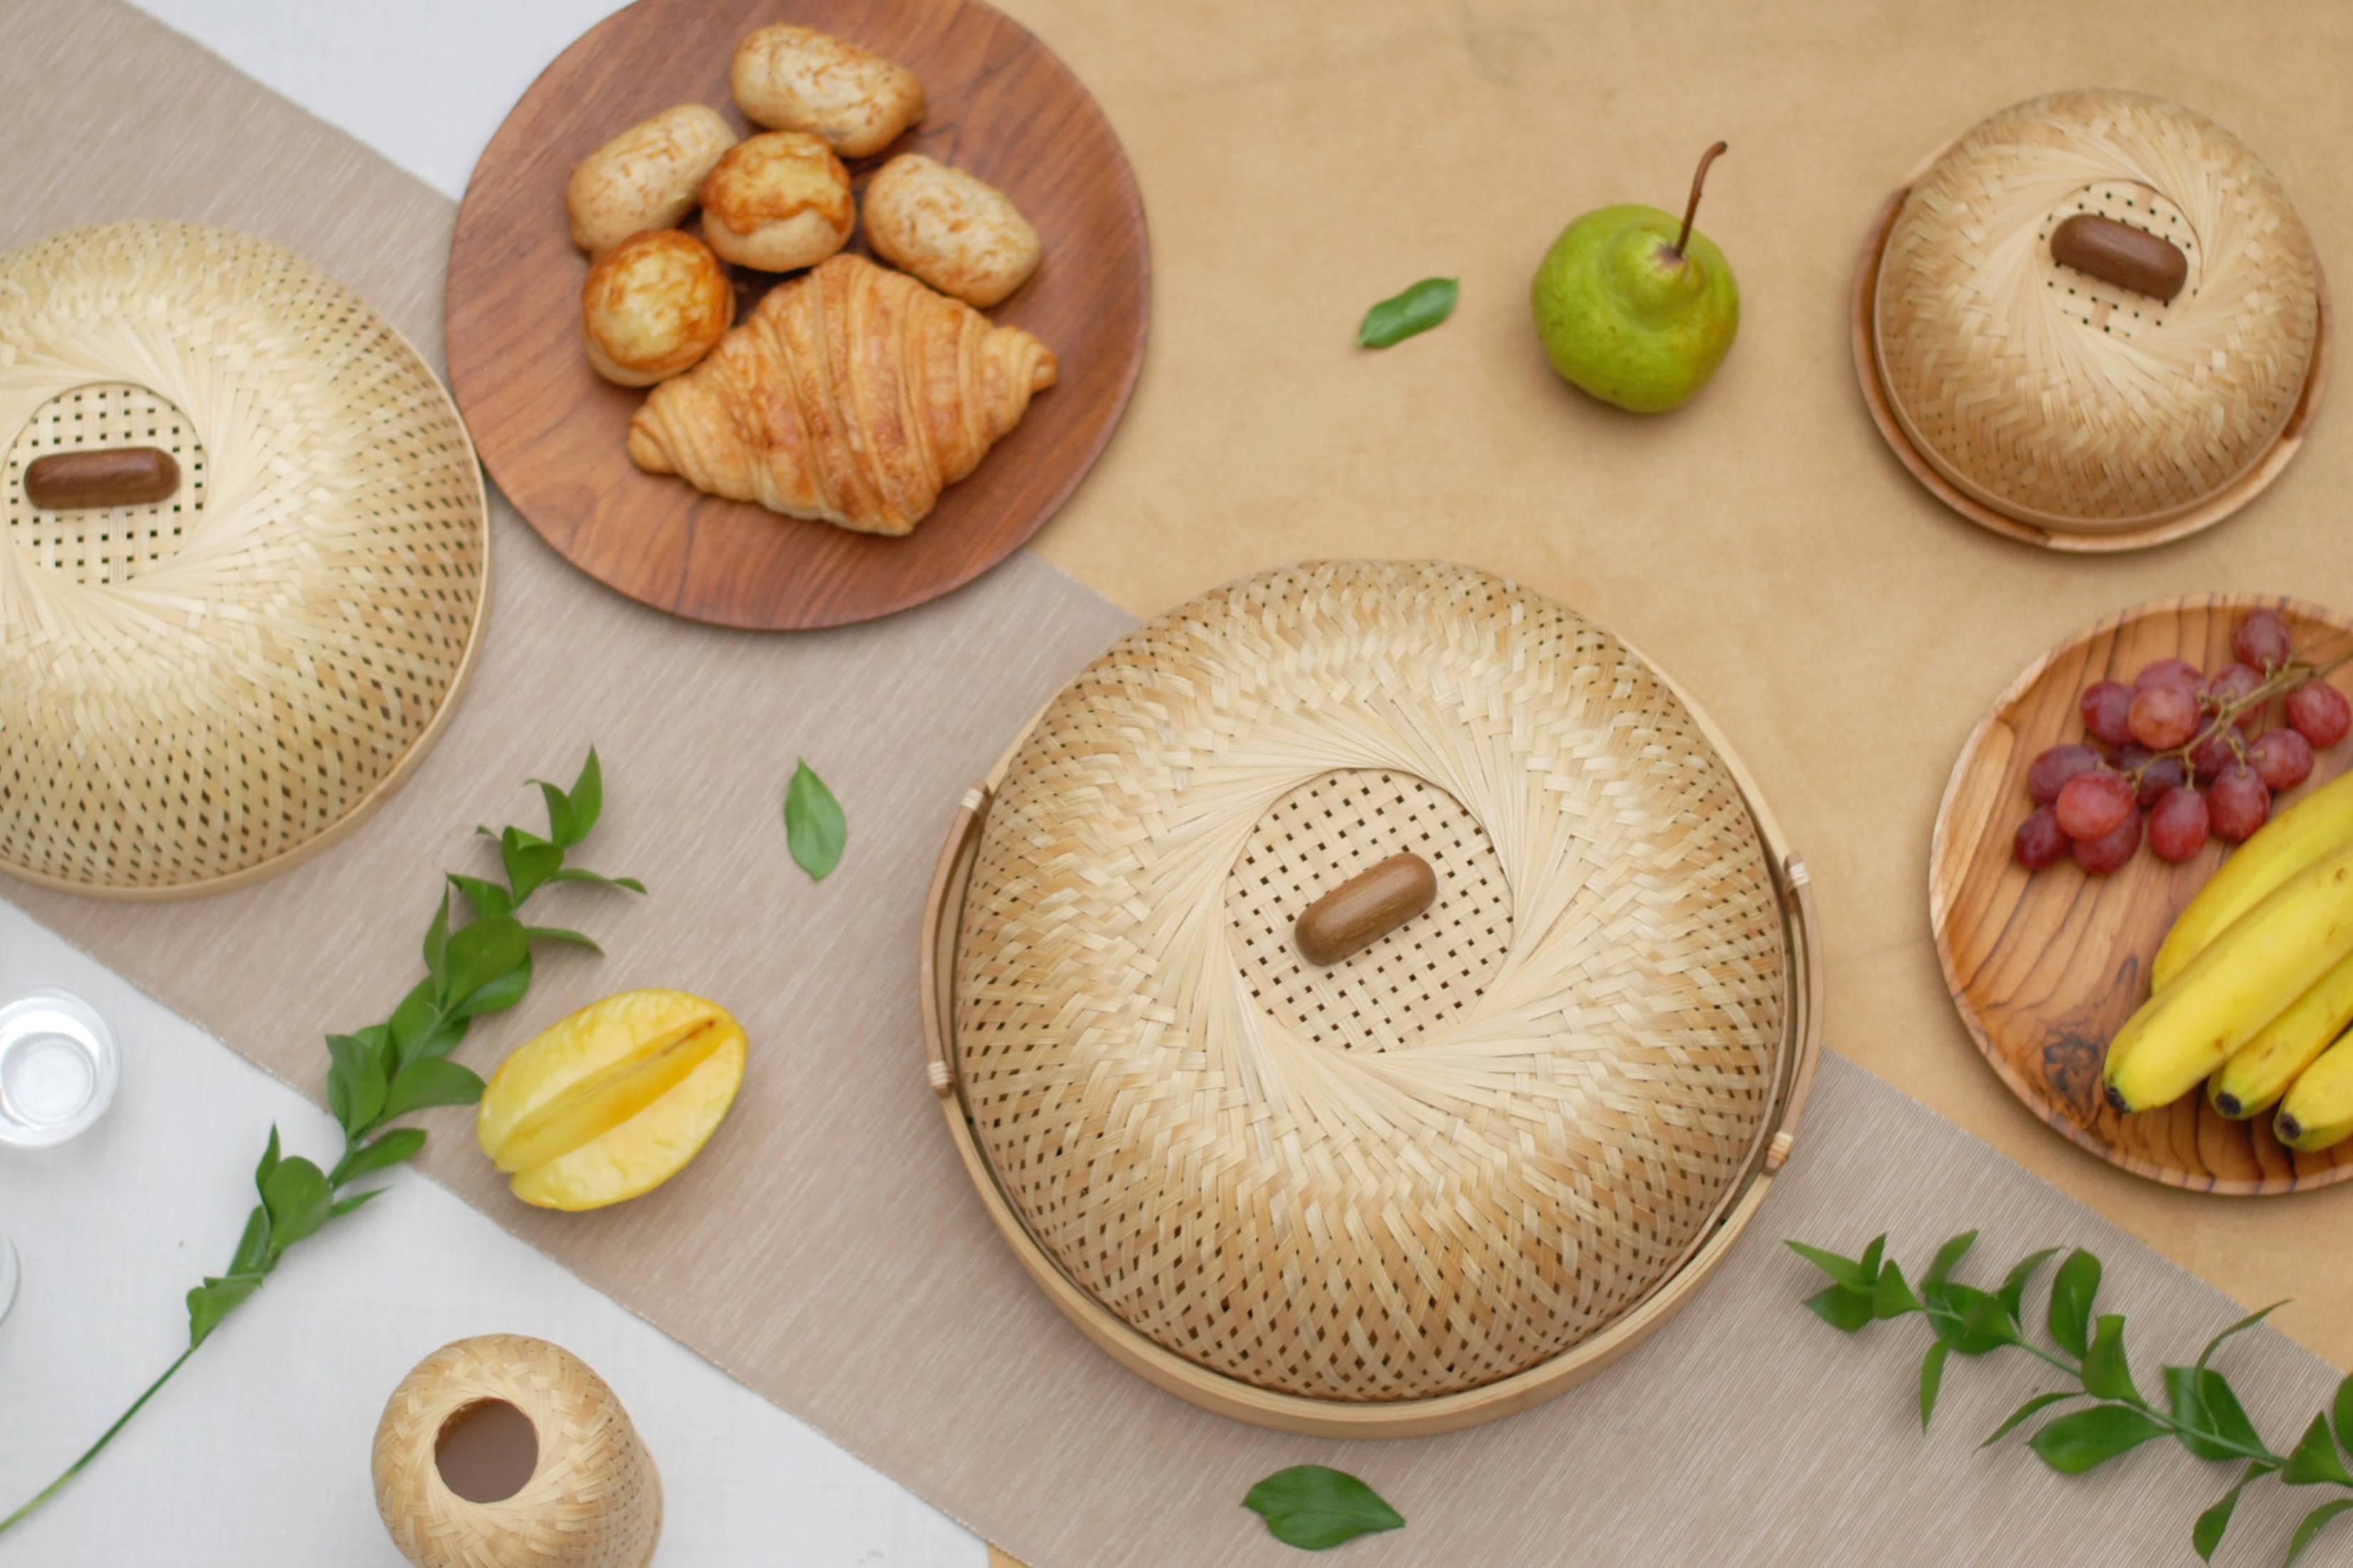 Studio Dapur, Bambus, Bambusgeschirr, Handarbeit, Indonesien, handgemacht, Bamboo